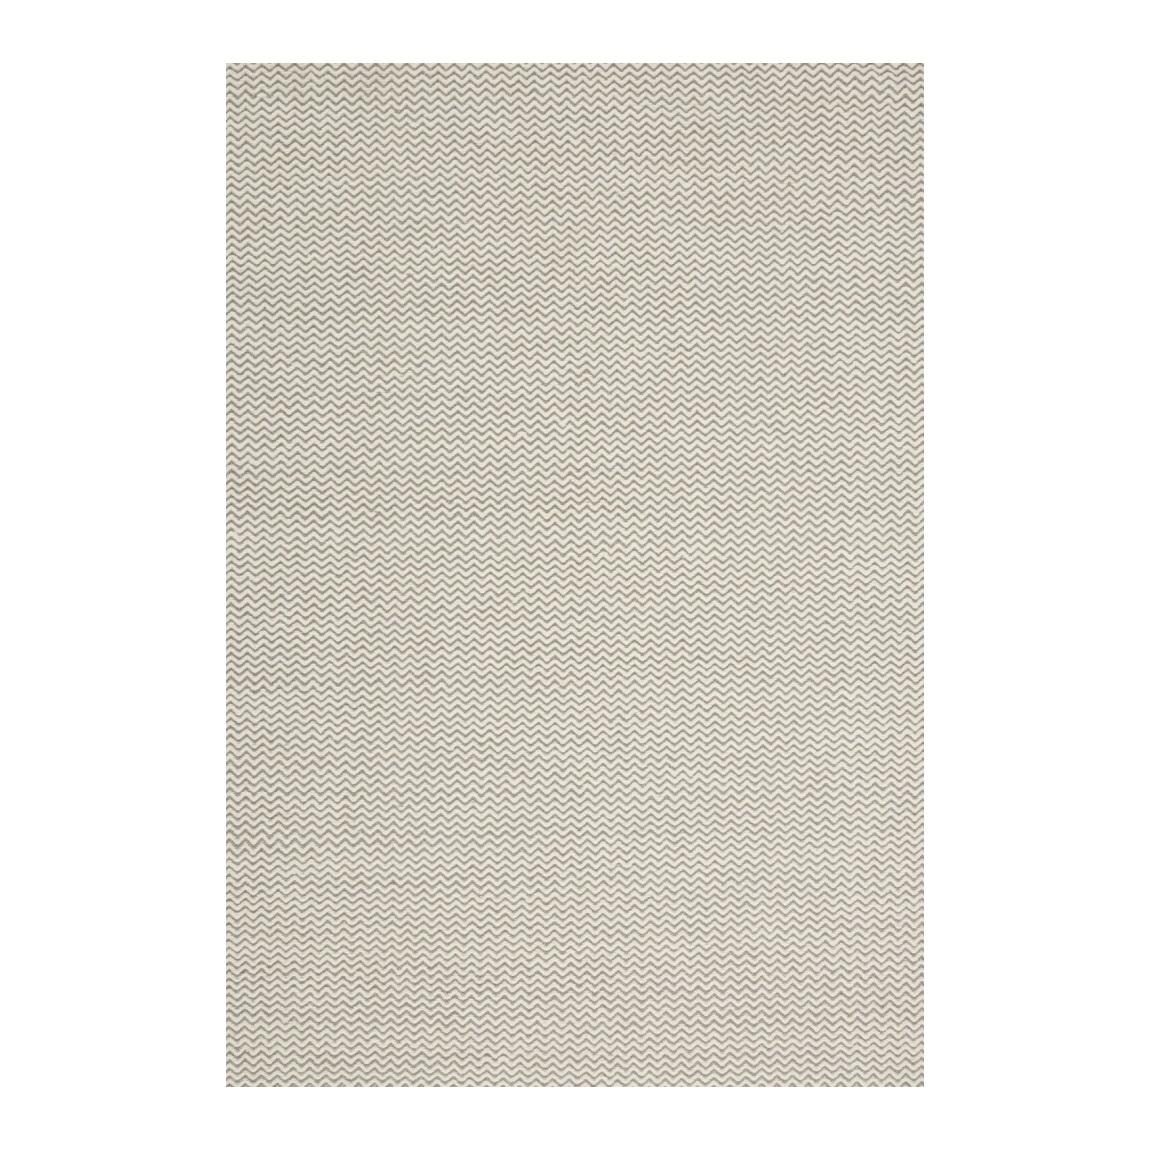 Ullmatta CORSA 140 x 200 cm ljusgrå, Linie Design